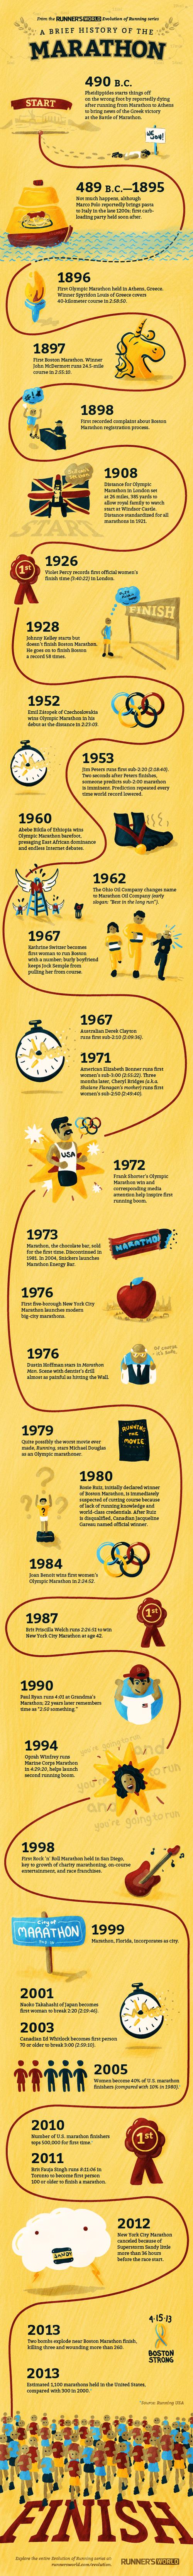 History of the Marathon